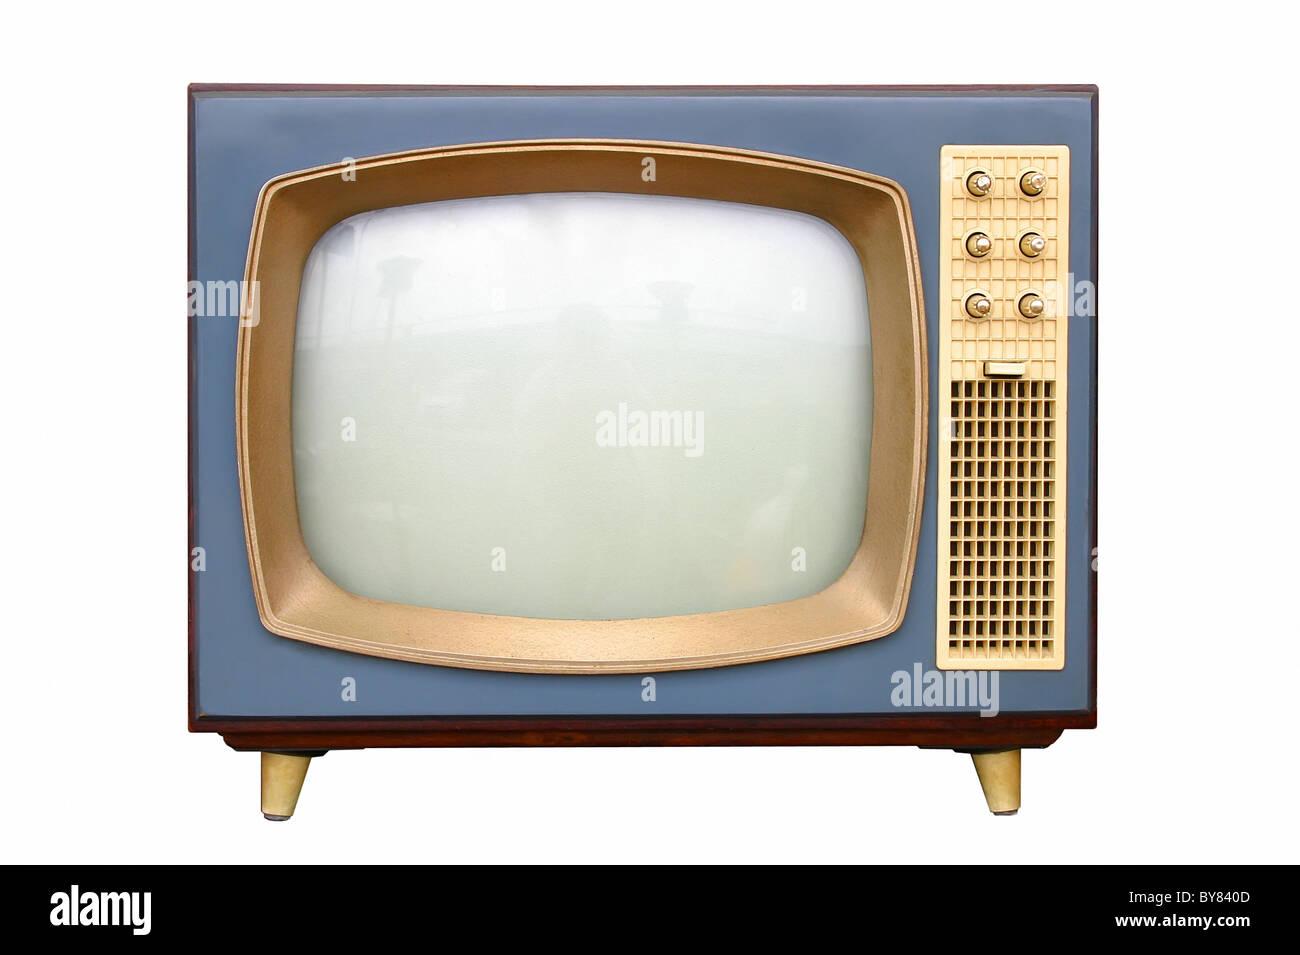 TV-Apparat von 1950 Stockbild